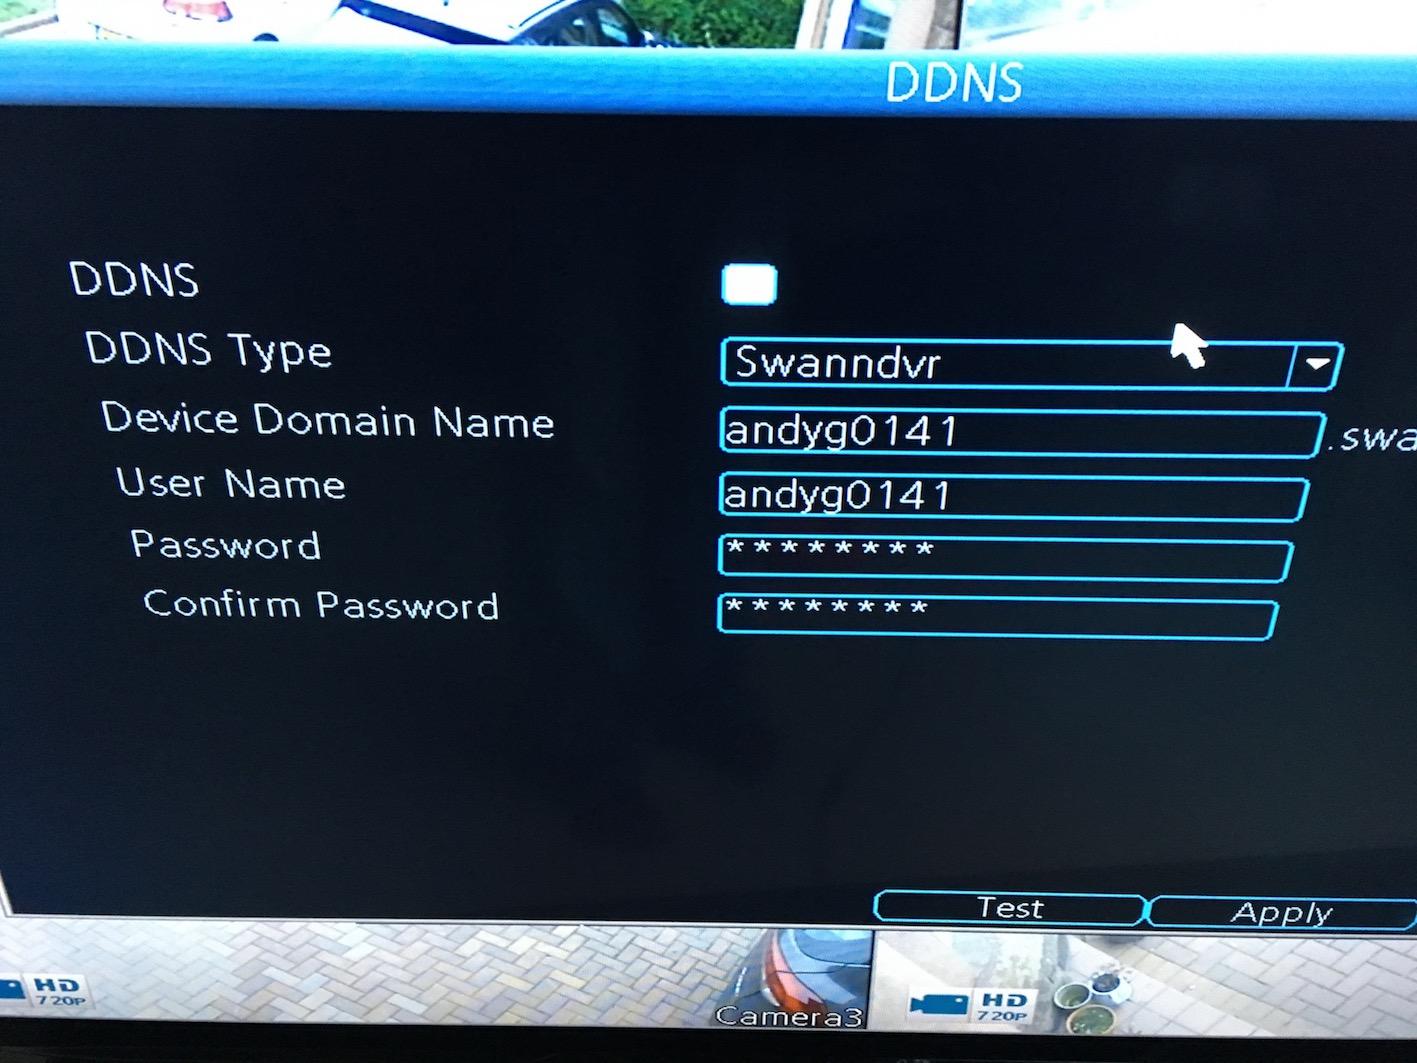 Home Hub 5 & Swann CCTV DDNS - BT Community